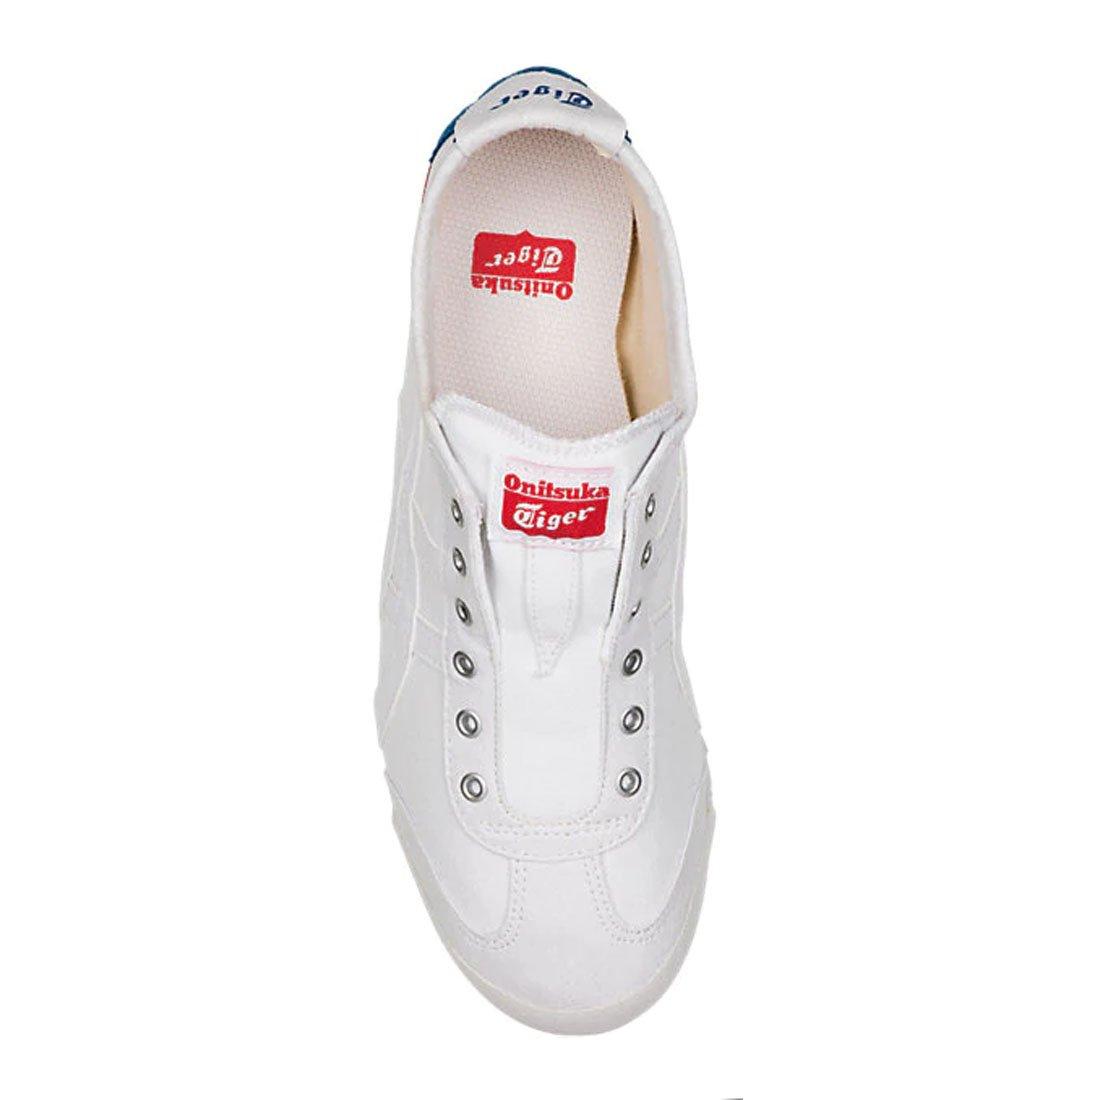 Onitsuka Tiger Mexico 66 Slip-On Classic Running Sneaker B07DRJZJ14 13 M US|White/White 2